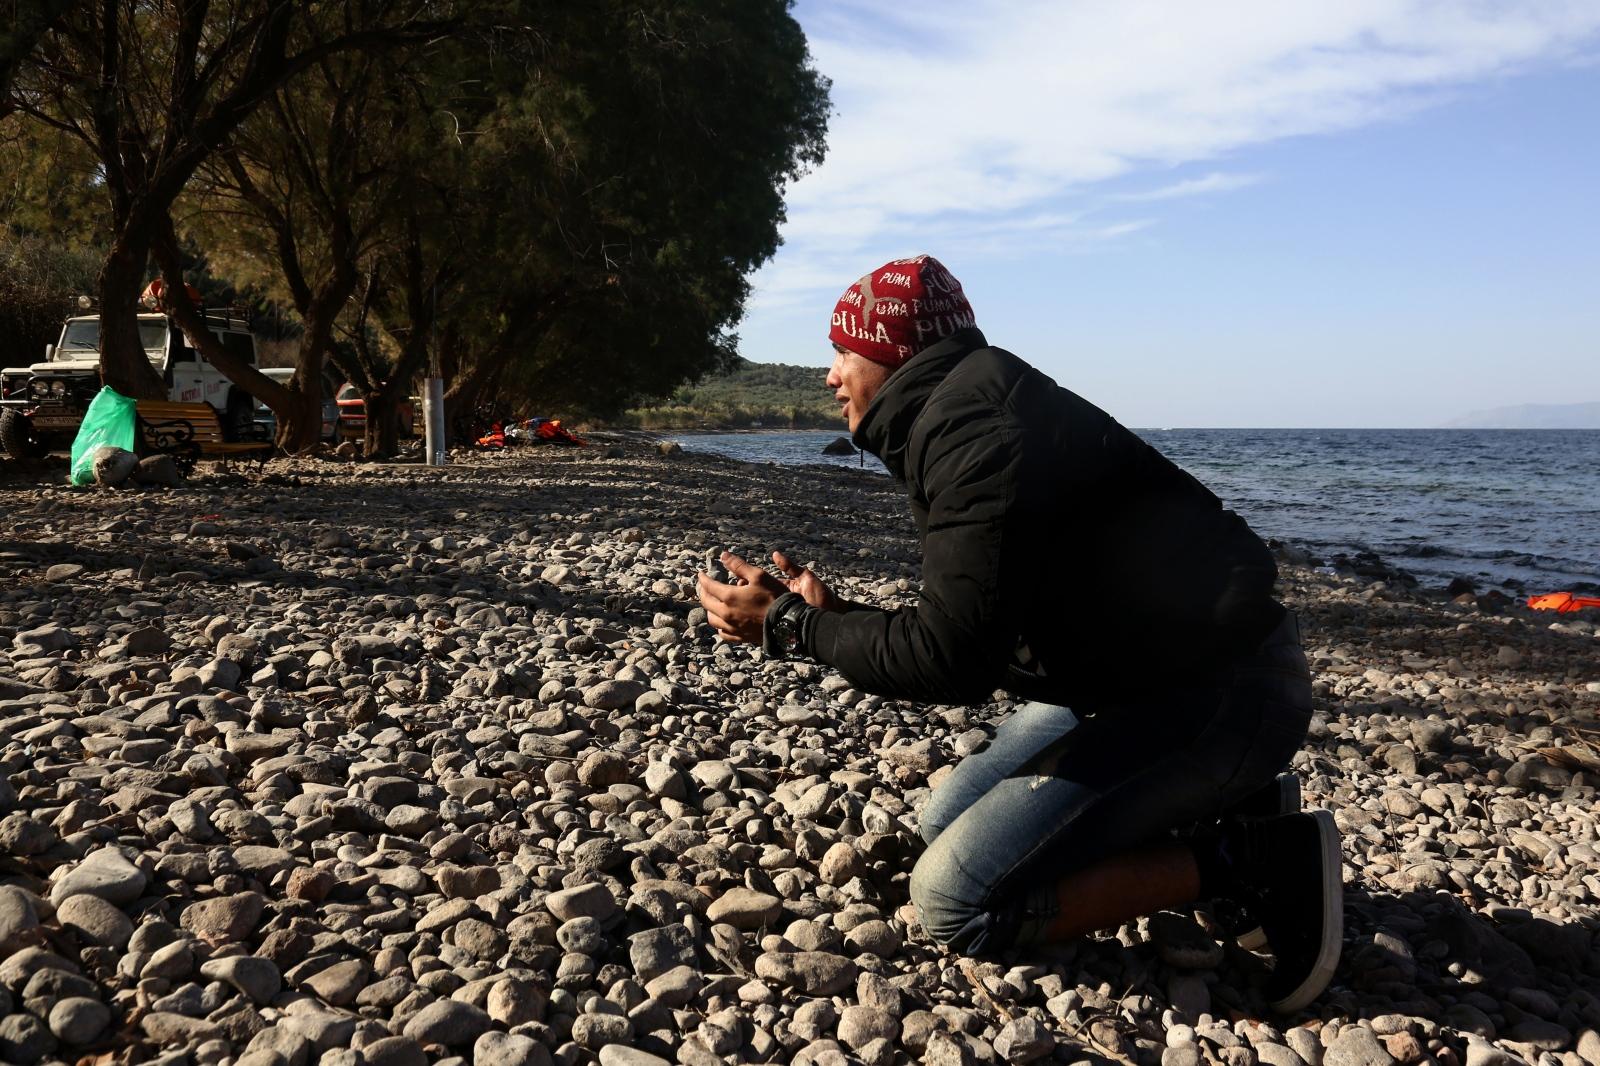 Art and Documentary Photography - Loading alexandros_katsis_lesbos_refuggies_18.jpg